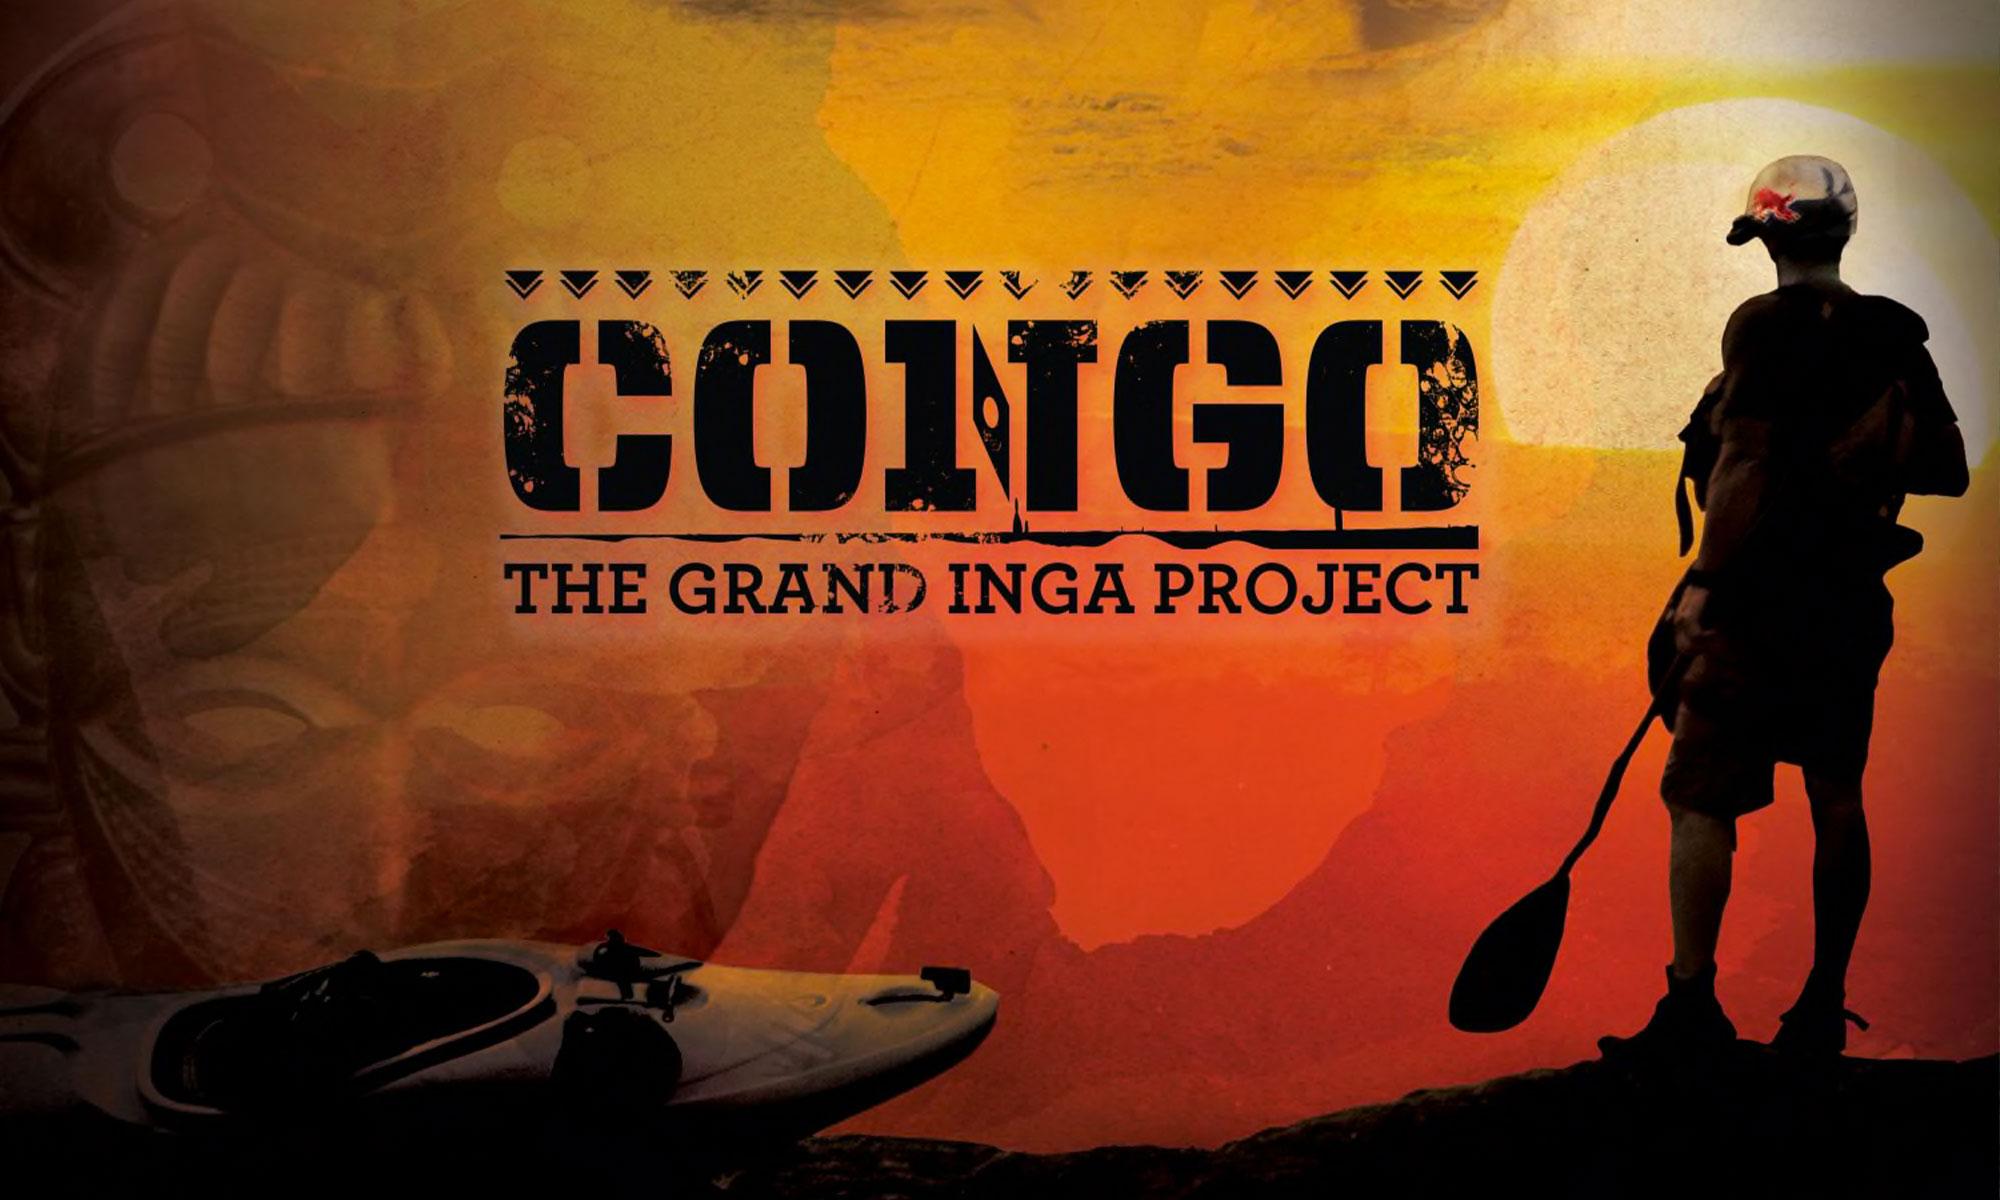 Congo, the grand Inga project